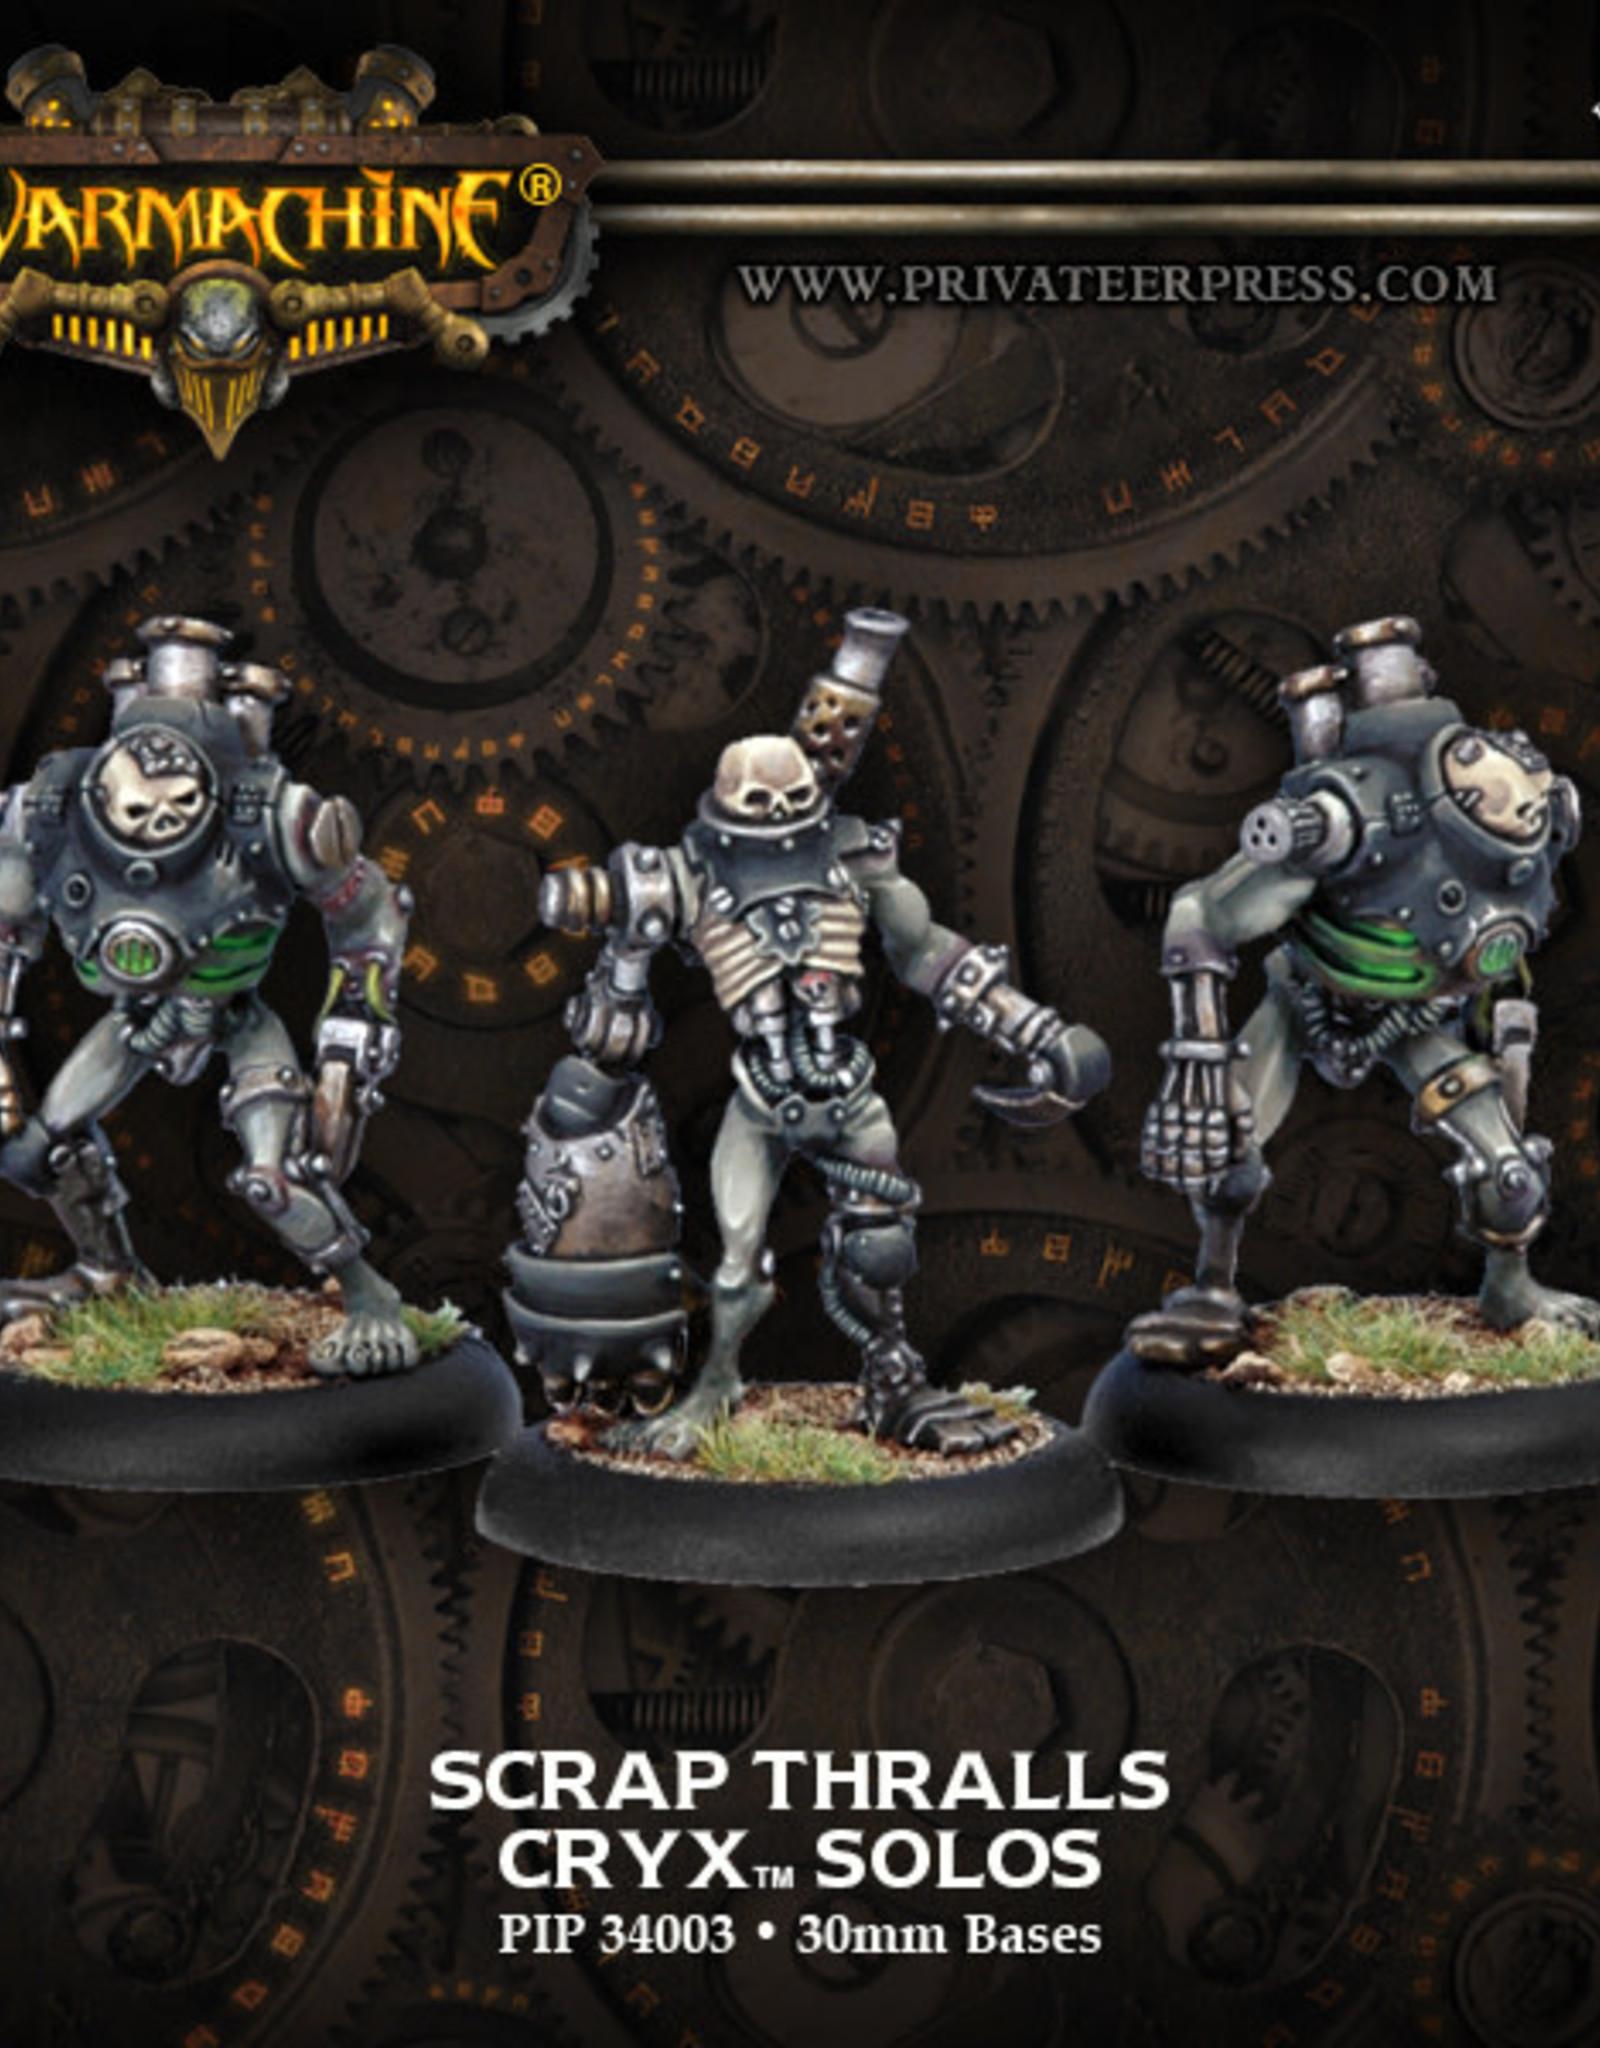 Warmachine Cryx - Scrap Thralls